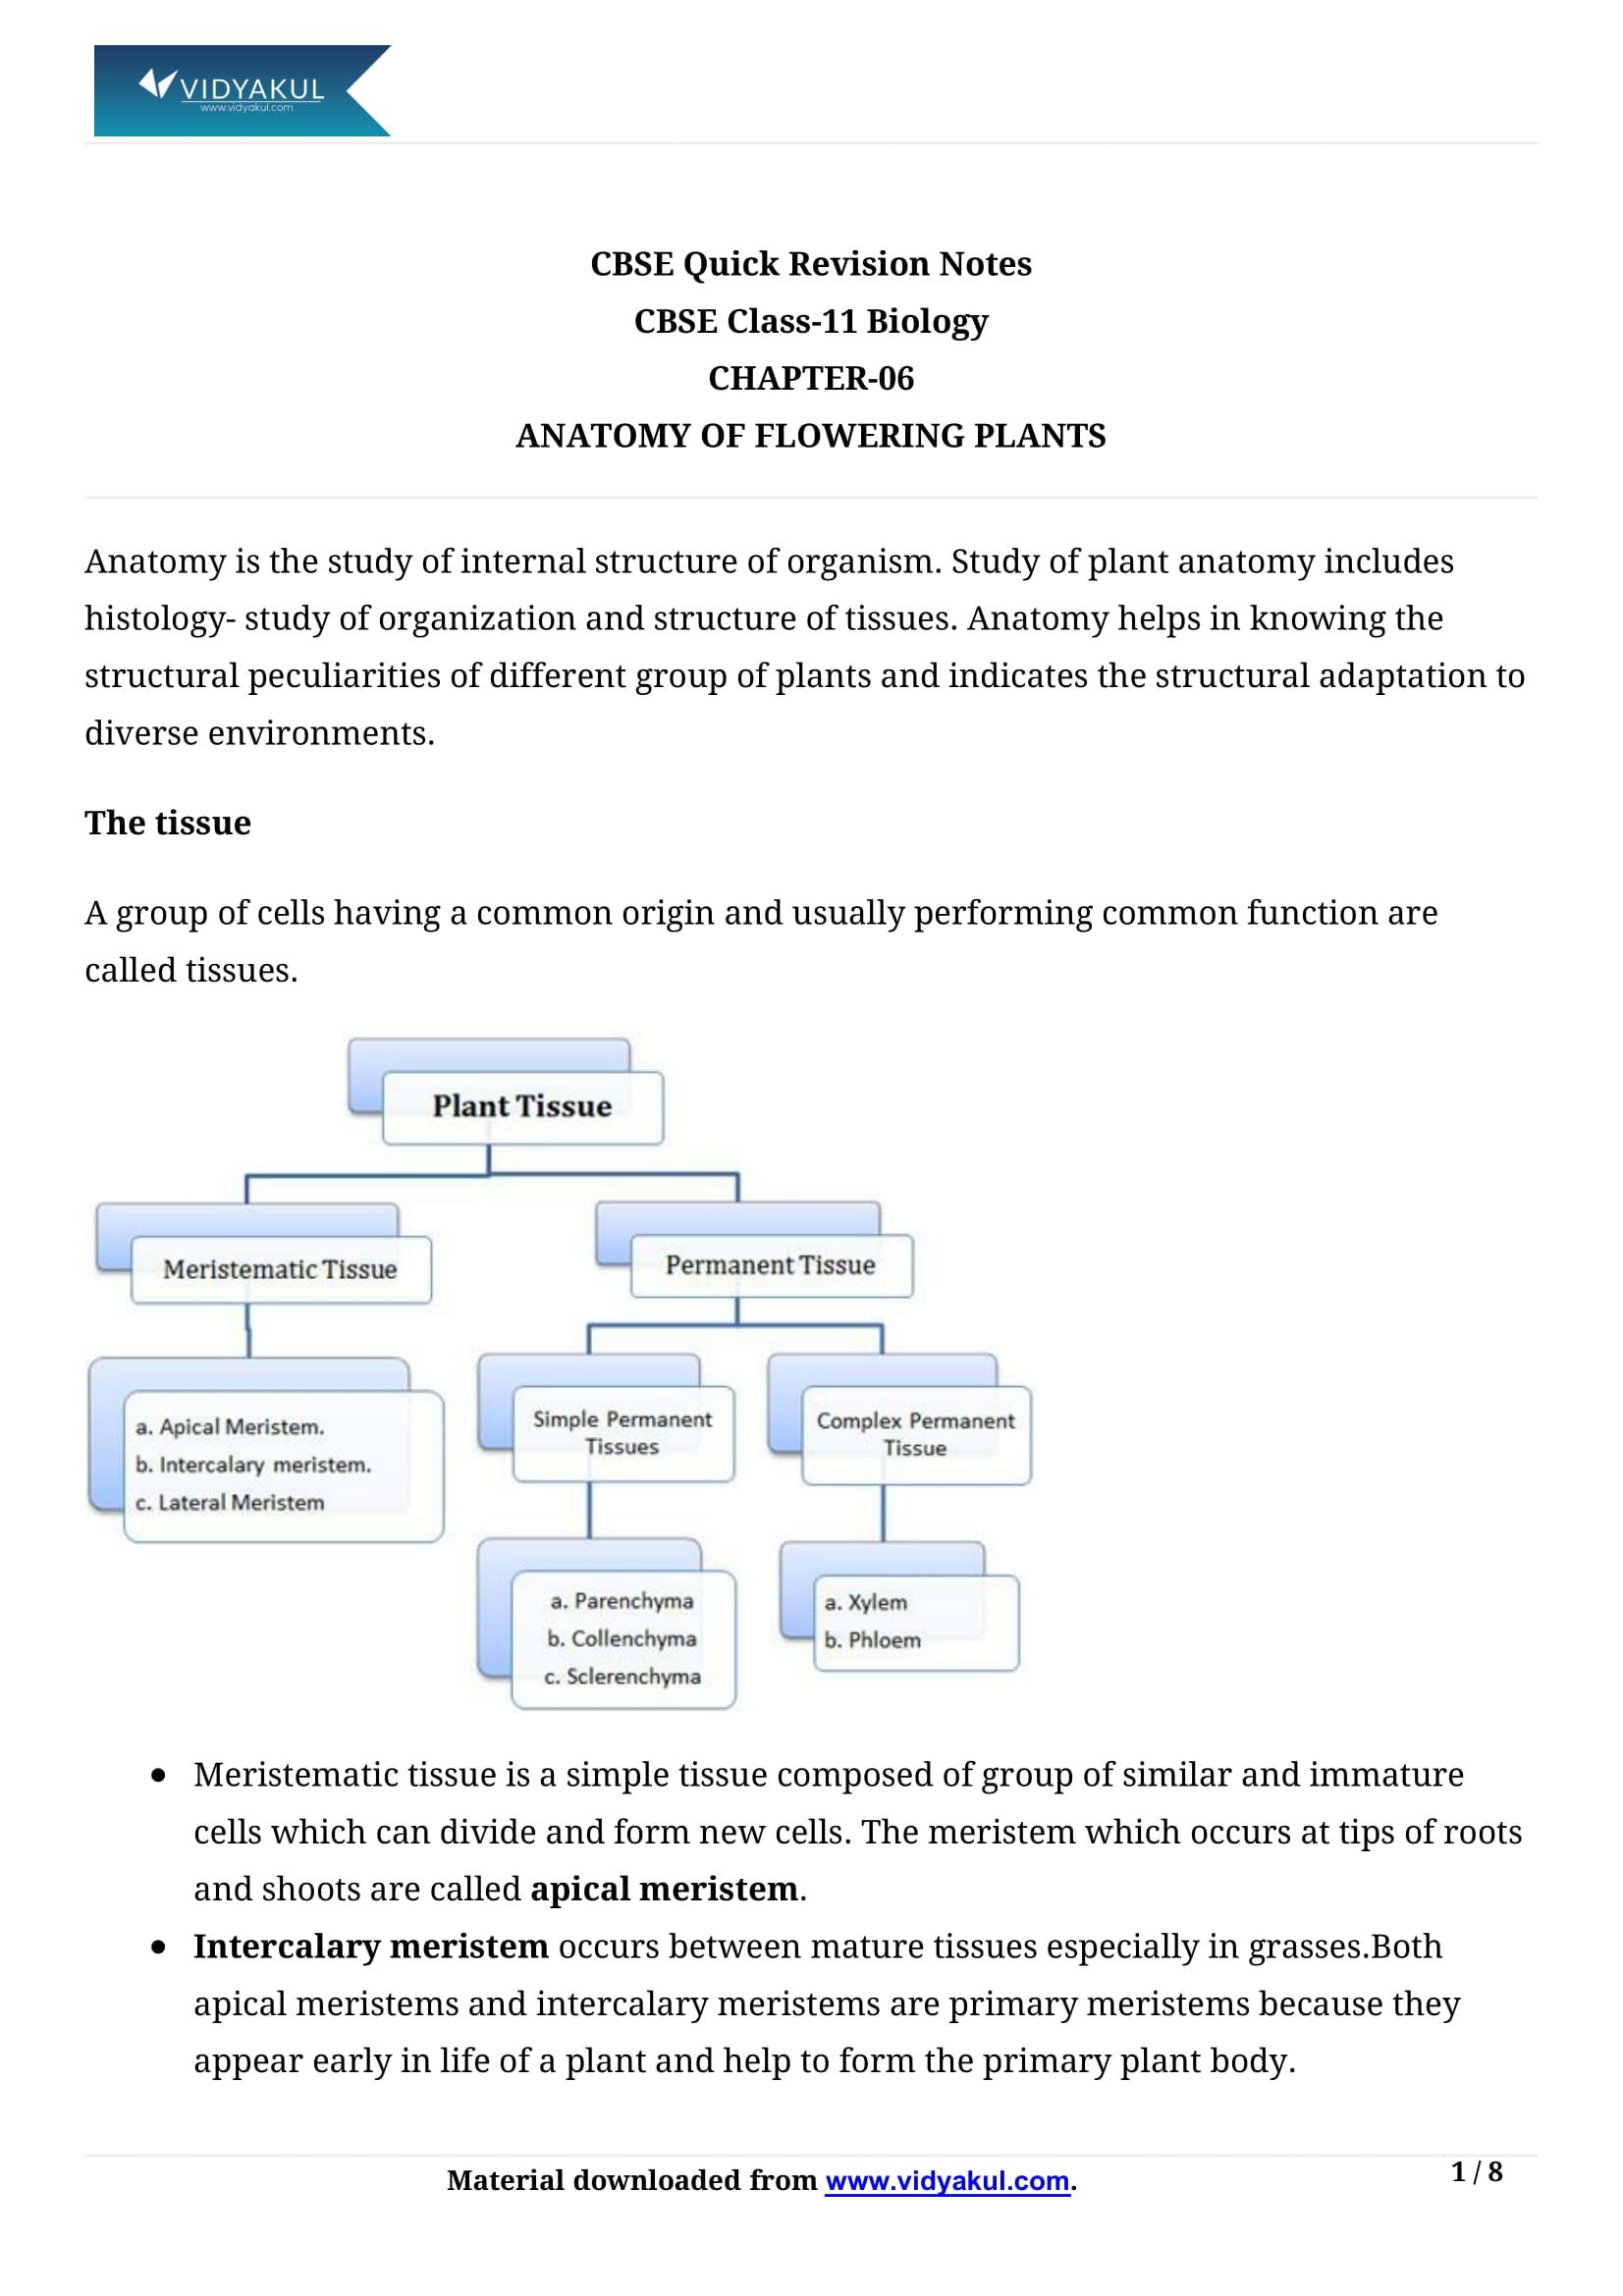 Anatomy Of Flowering Plants Class 11 Notes Vidyakul